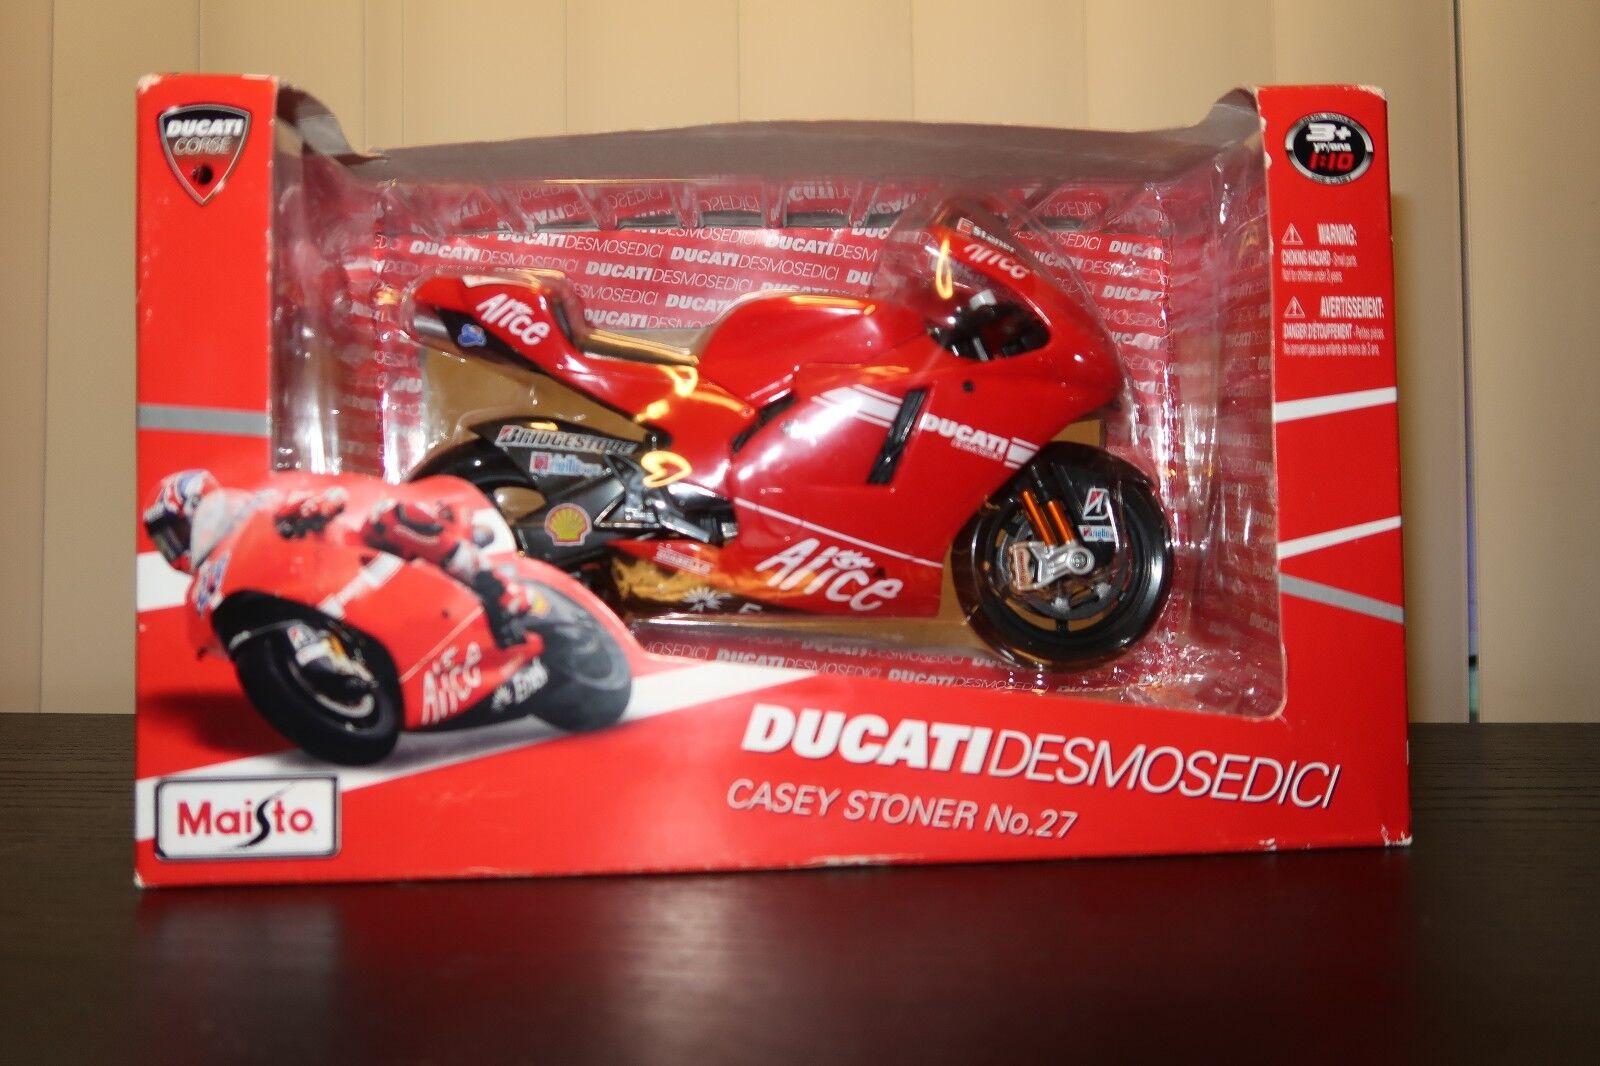 1 10 Scale Moto DUCATI DESMOSEDICI CASEY STONER No.27 diecast diecast diecast (2009) Maisto acca0a